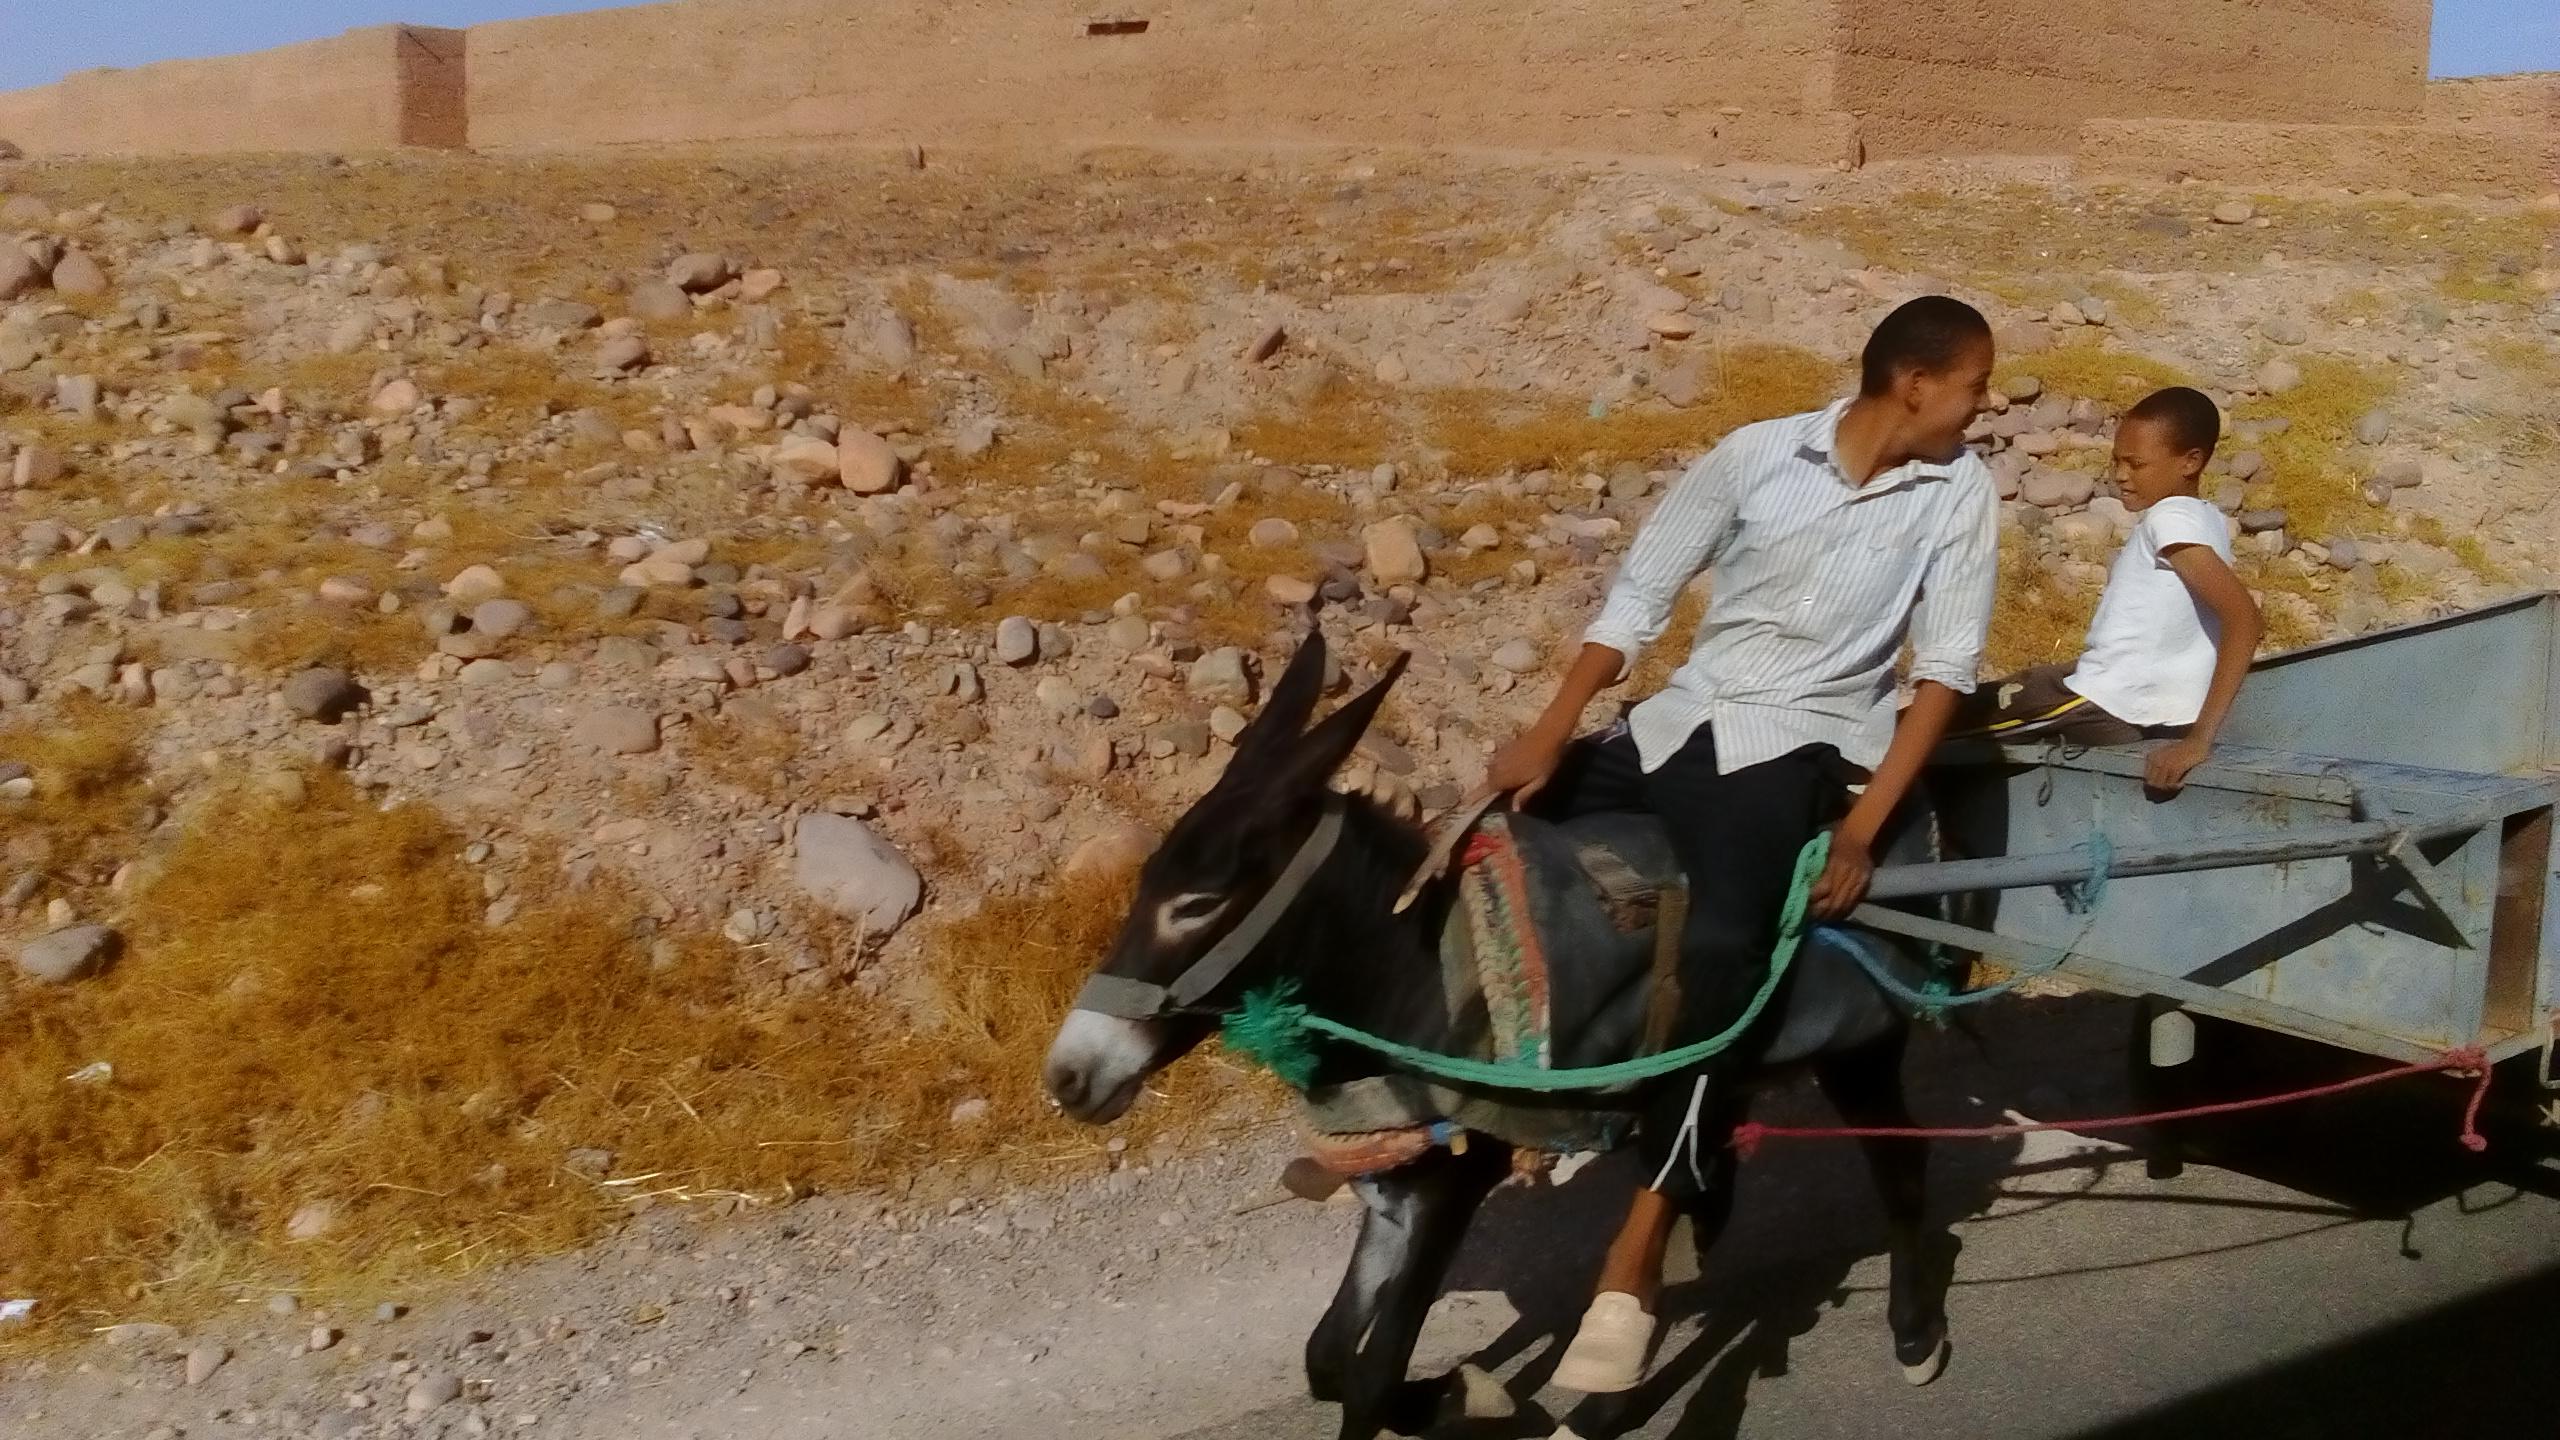 MarokoNaOsiolkuDSC_0482